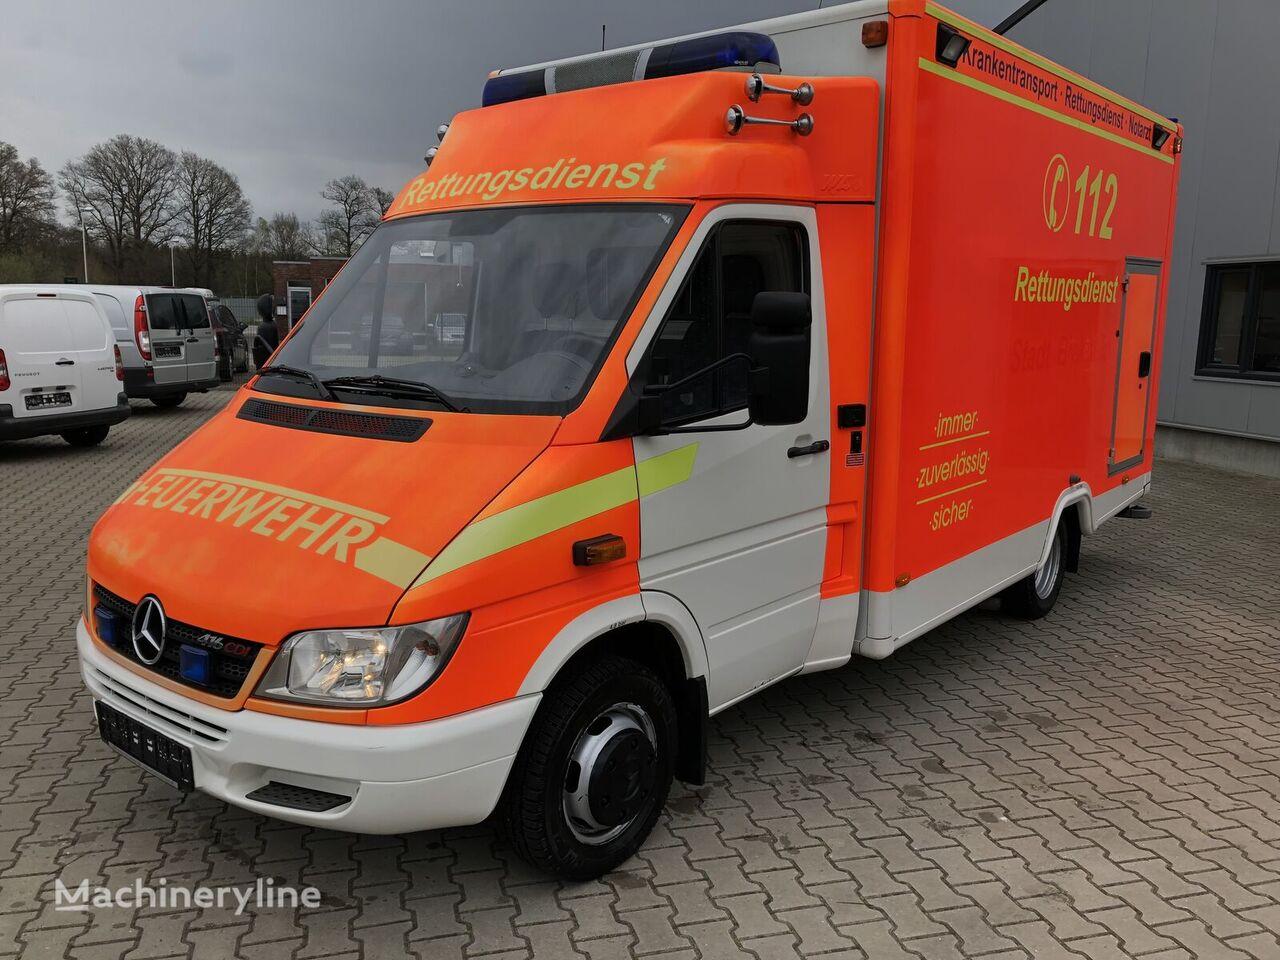 MERCEDES-BENZ Mercedes-Benz Sprinter 416 CDI Aut.Klima Standh. ATM ambulance